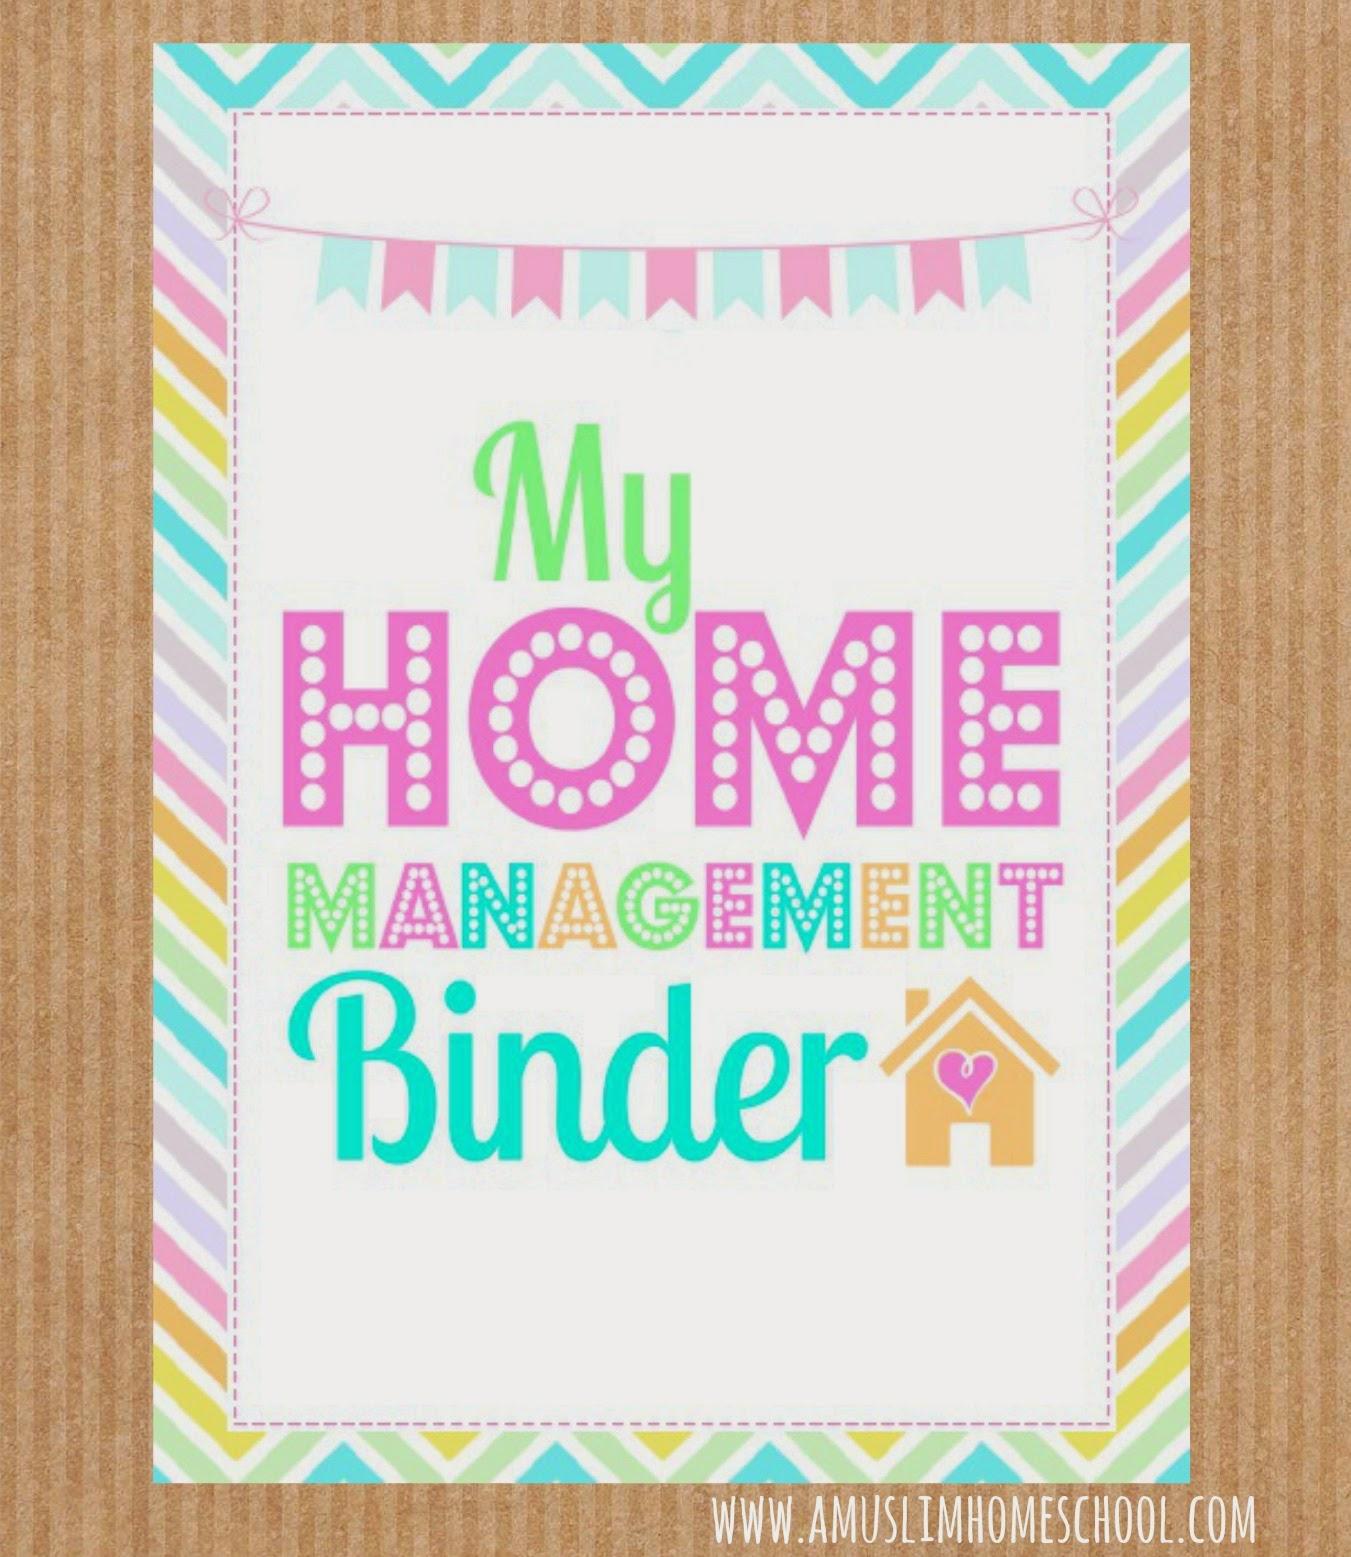 Free home management binder printables just b cause for Home construction binder